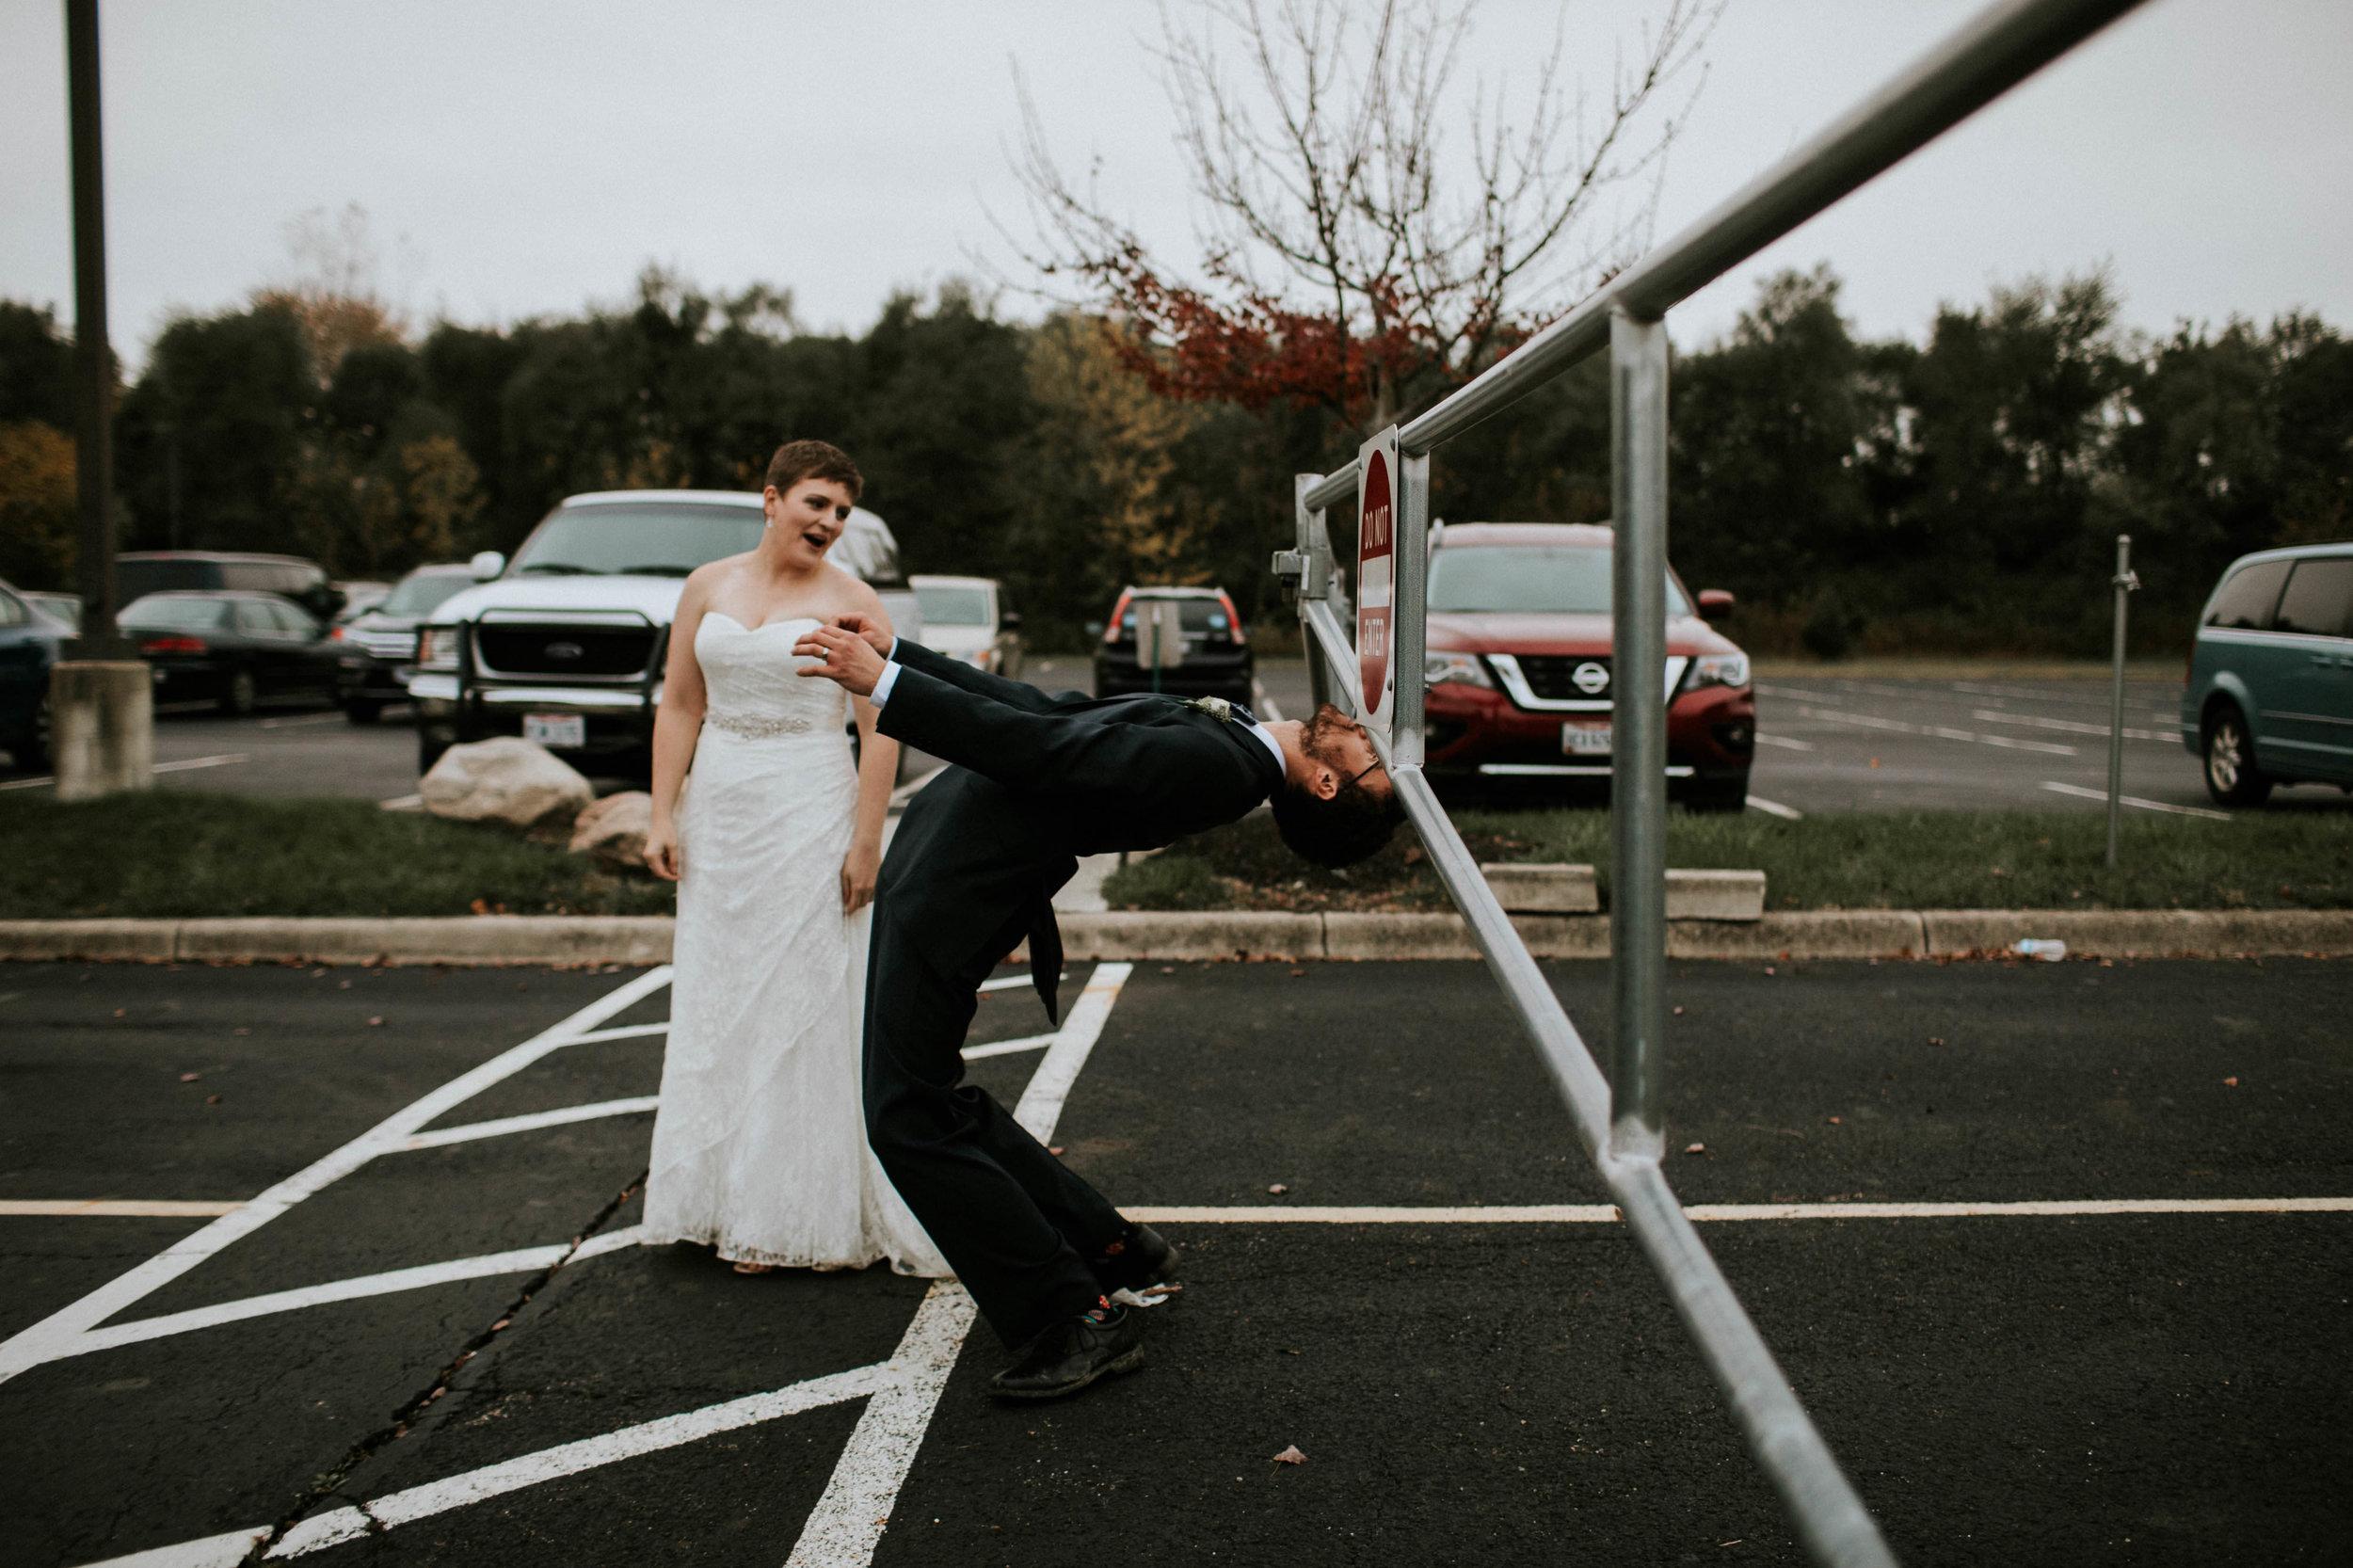 Columbus ohio wedding photographer grace e jones photography real fun joyful wedding65.jpg